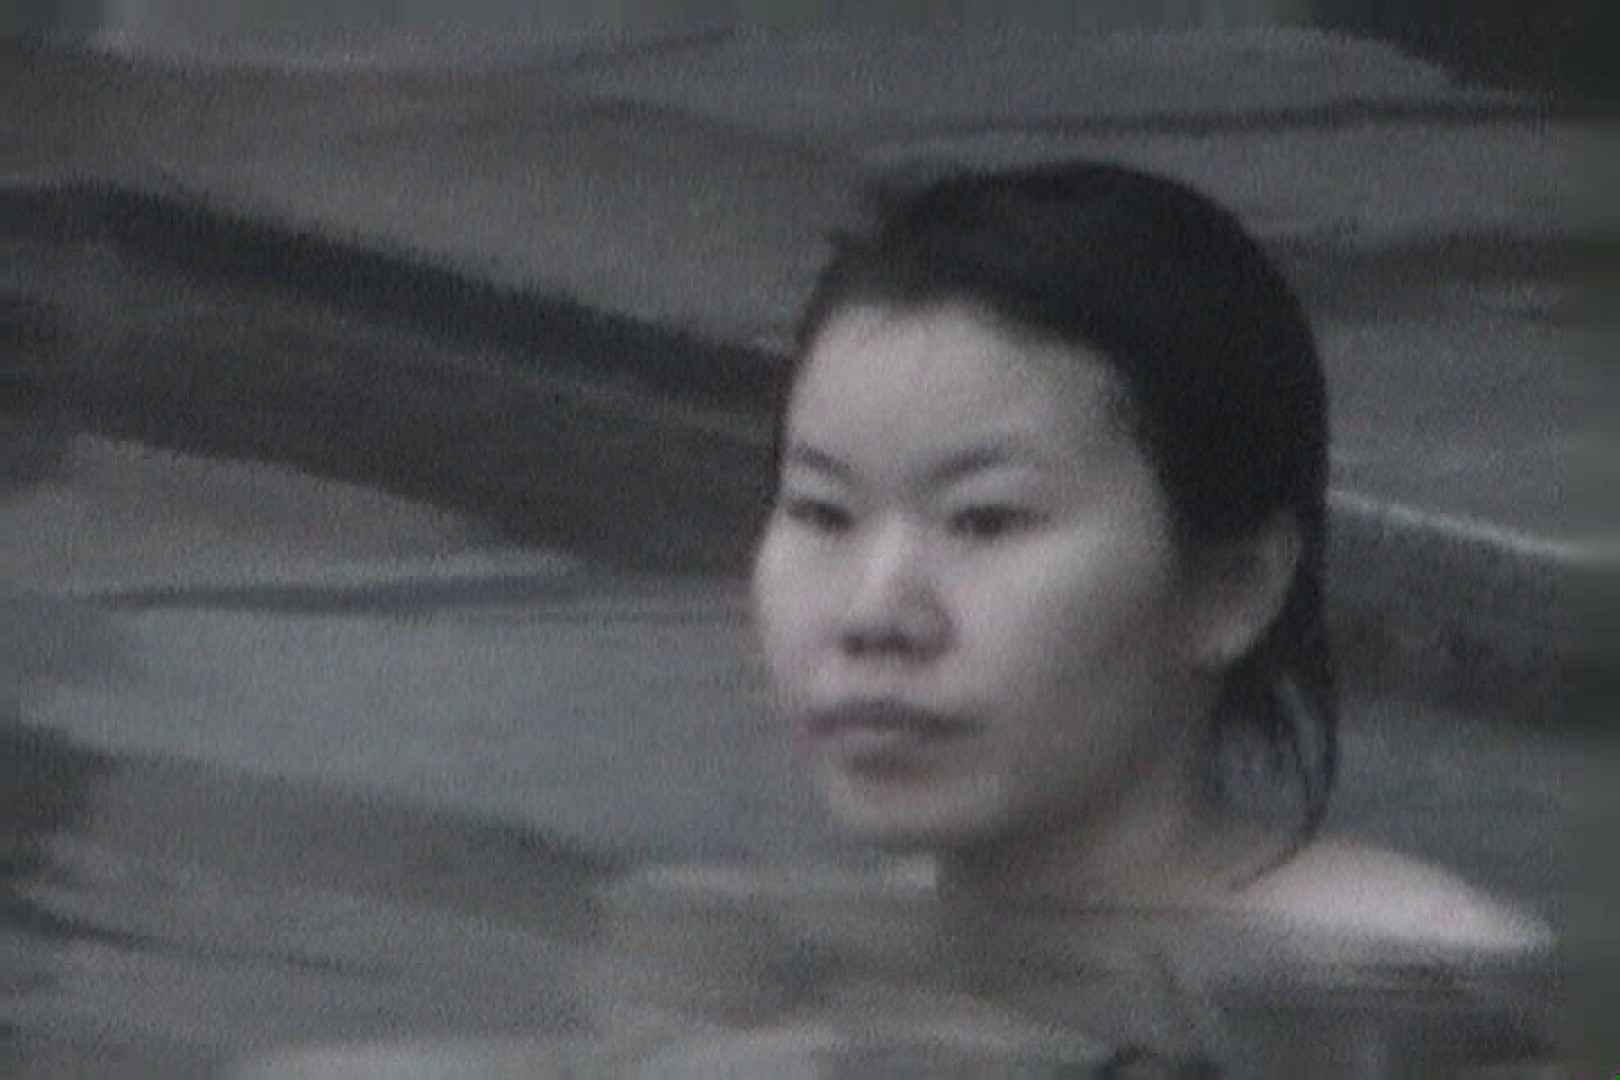 Aquaな露天風呂Vol.556 露天風呂編 | 盗撮シリーズ  99PIX 9